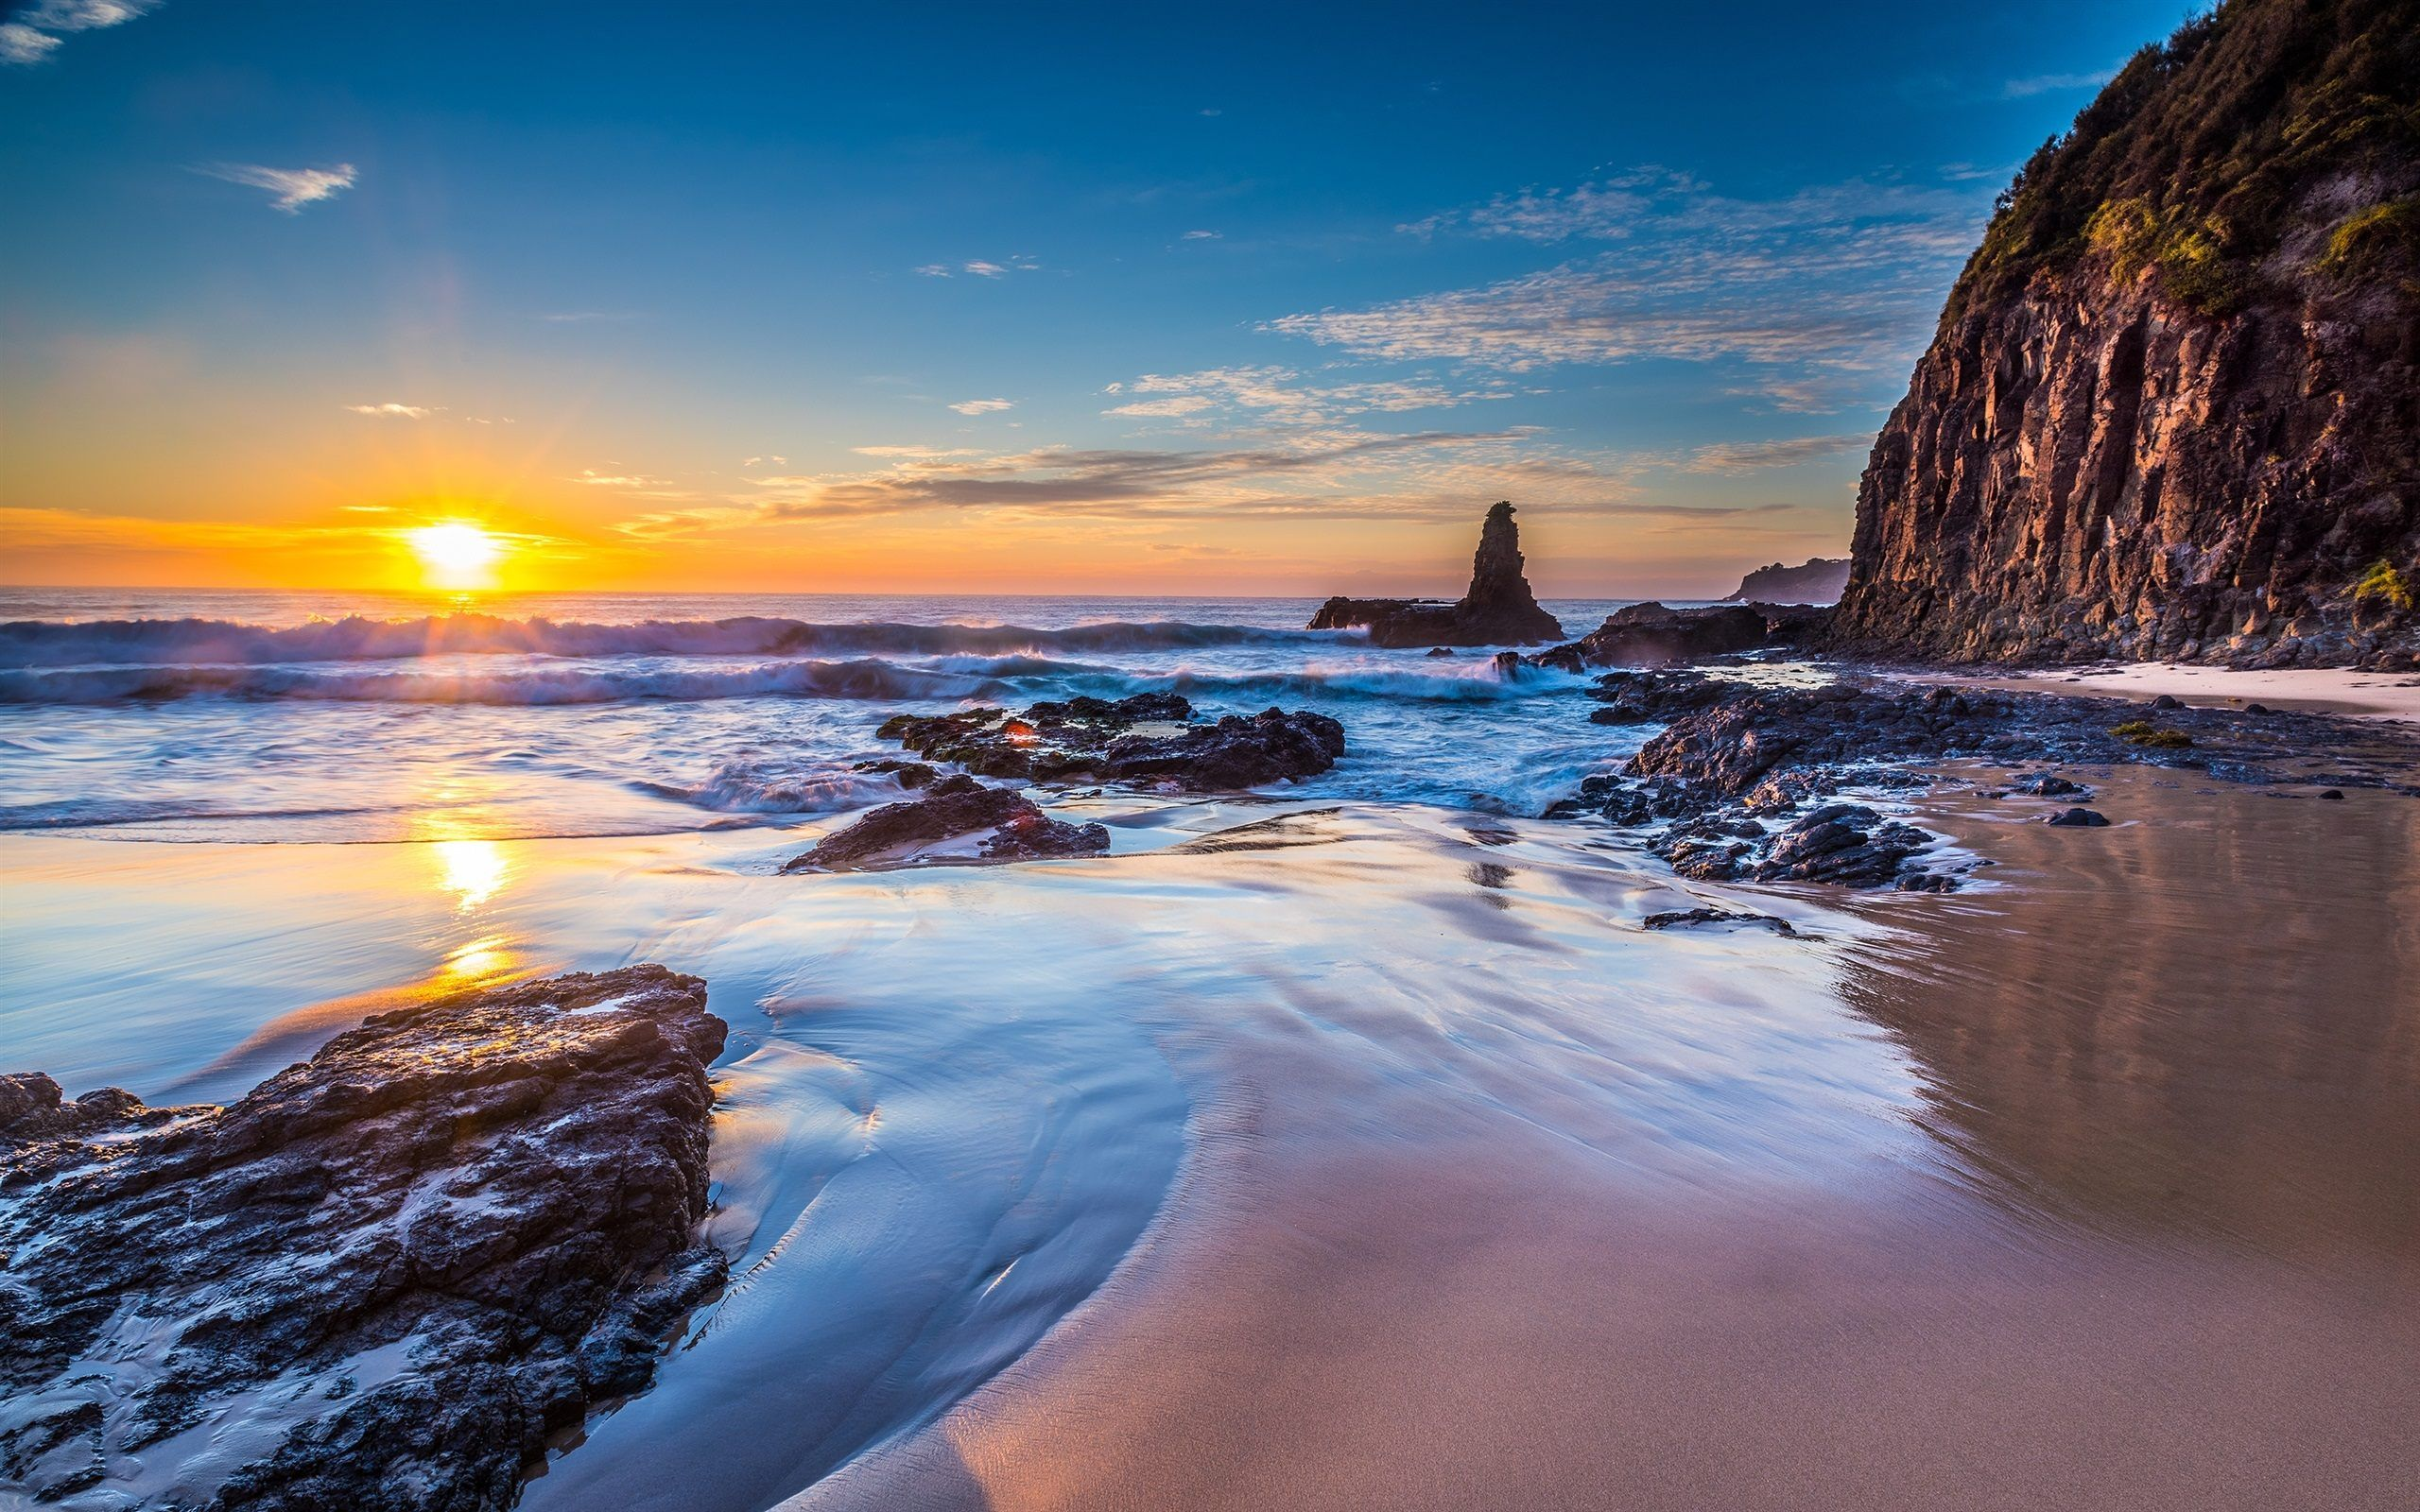 Jones Beach Australia Wallpaper Hd Download For Desktop Landscape Wallpaper Desktop Photography Landscape Walls